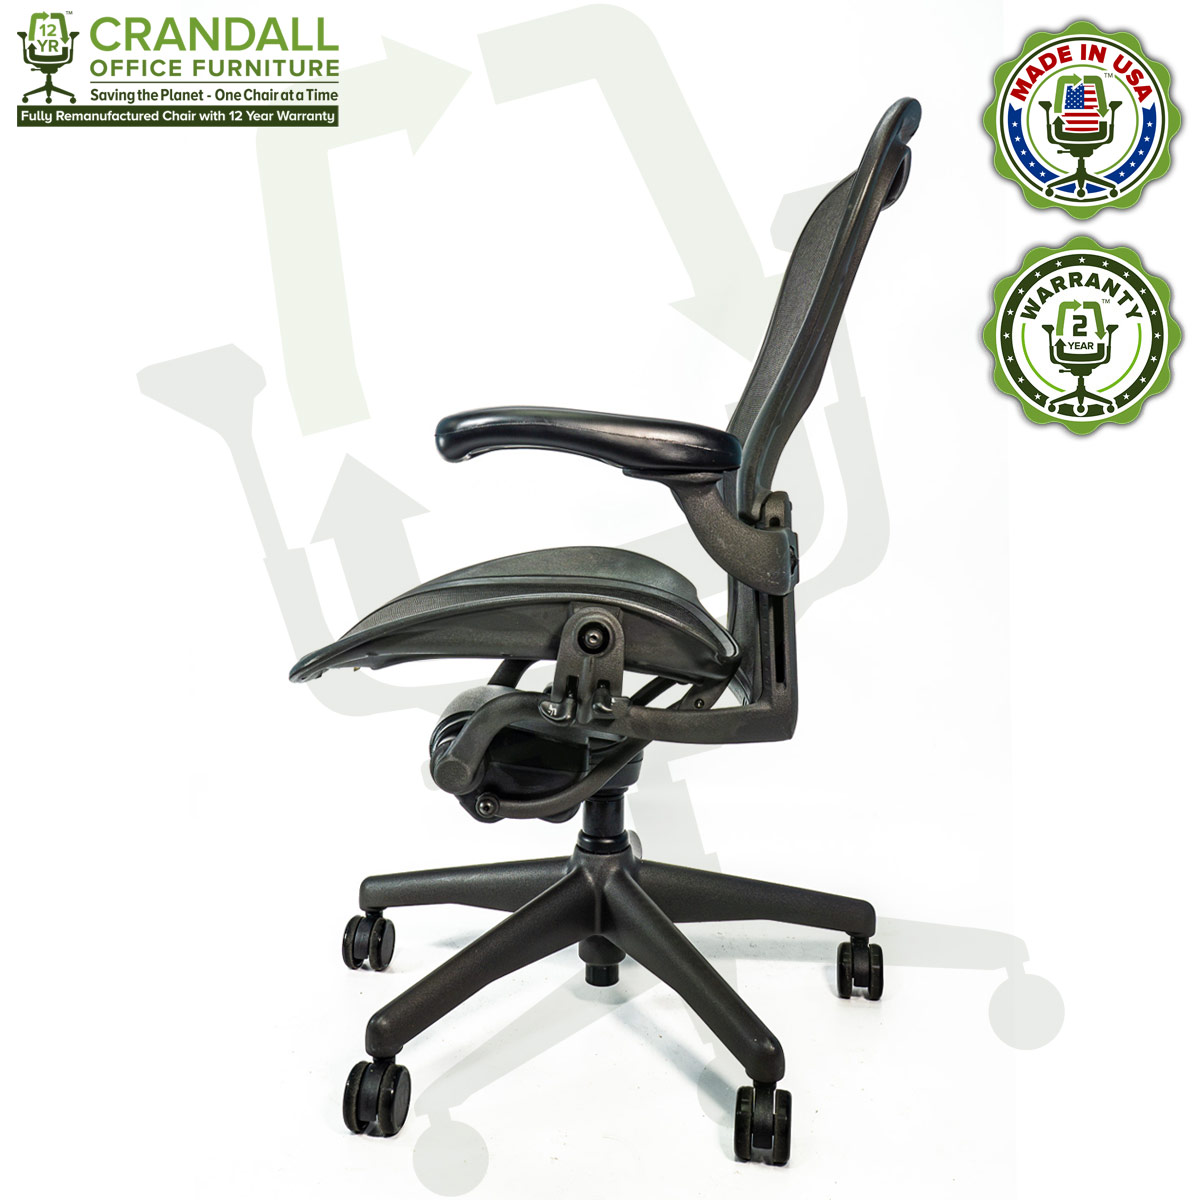 Crandall Office Refurbished Herman Miller Aeron Chair - Size C - 0003